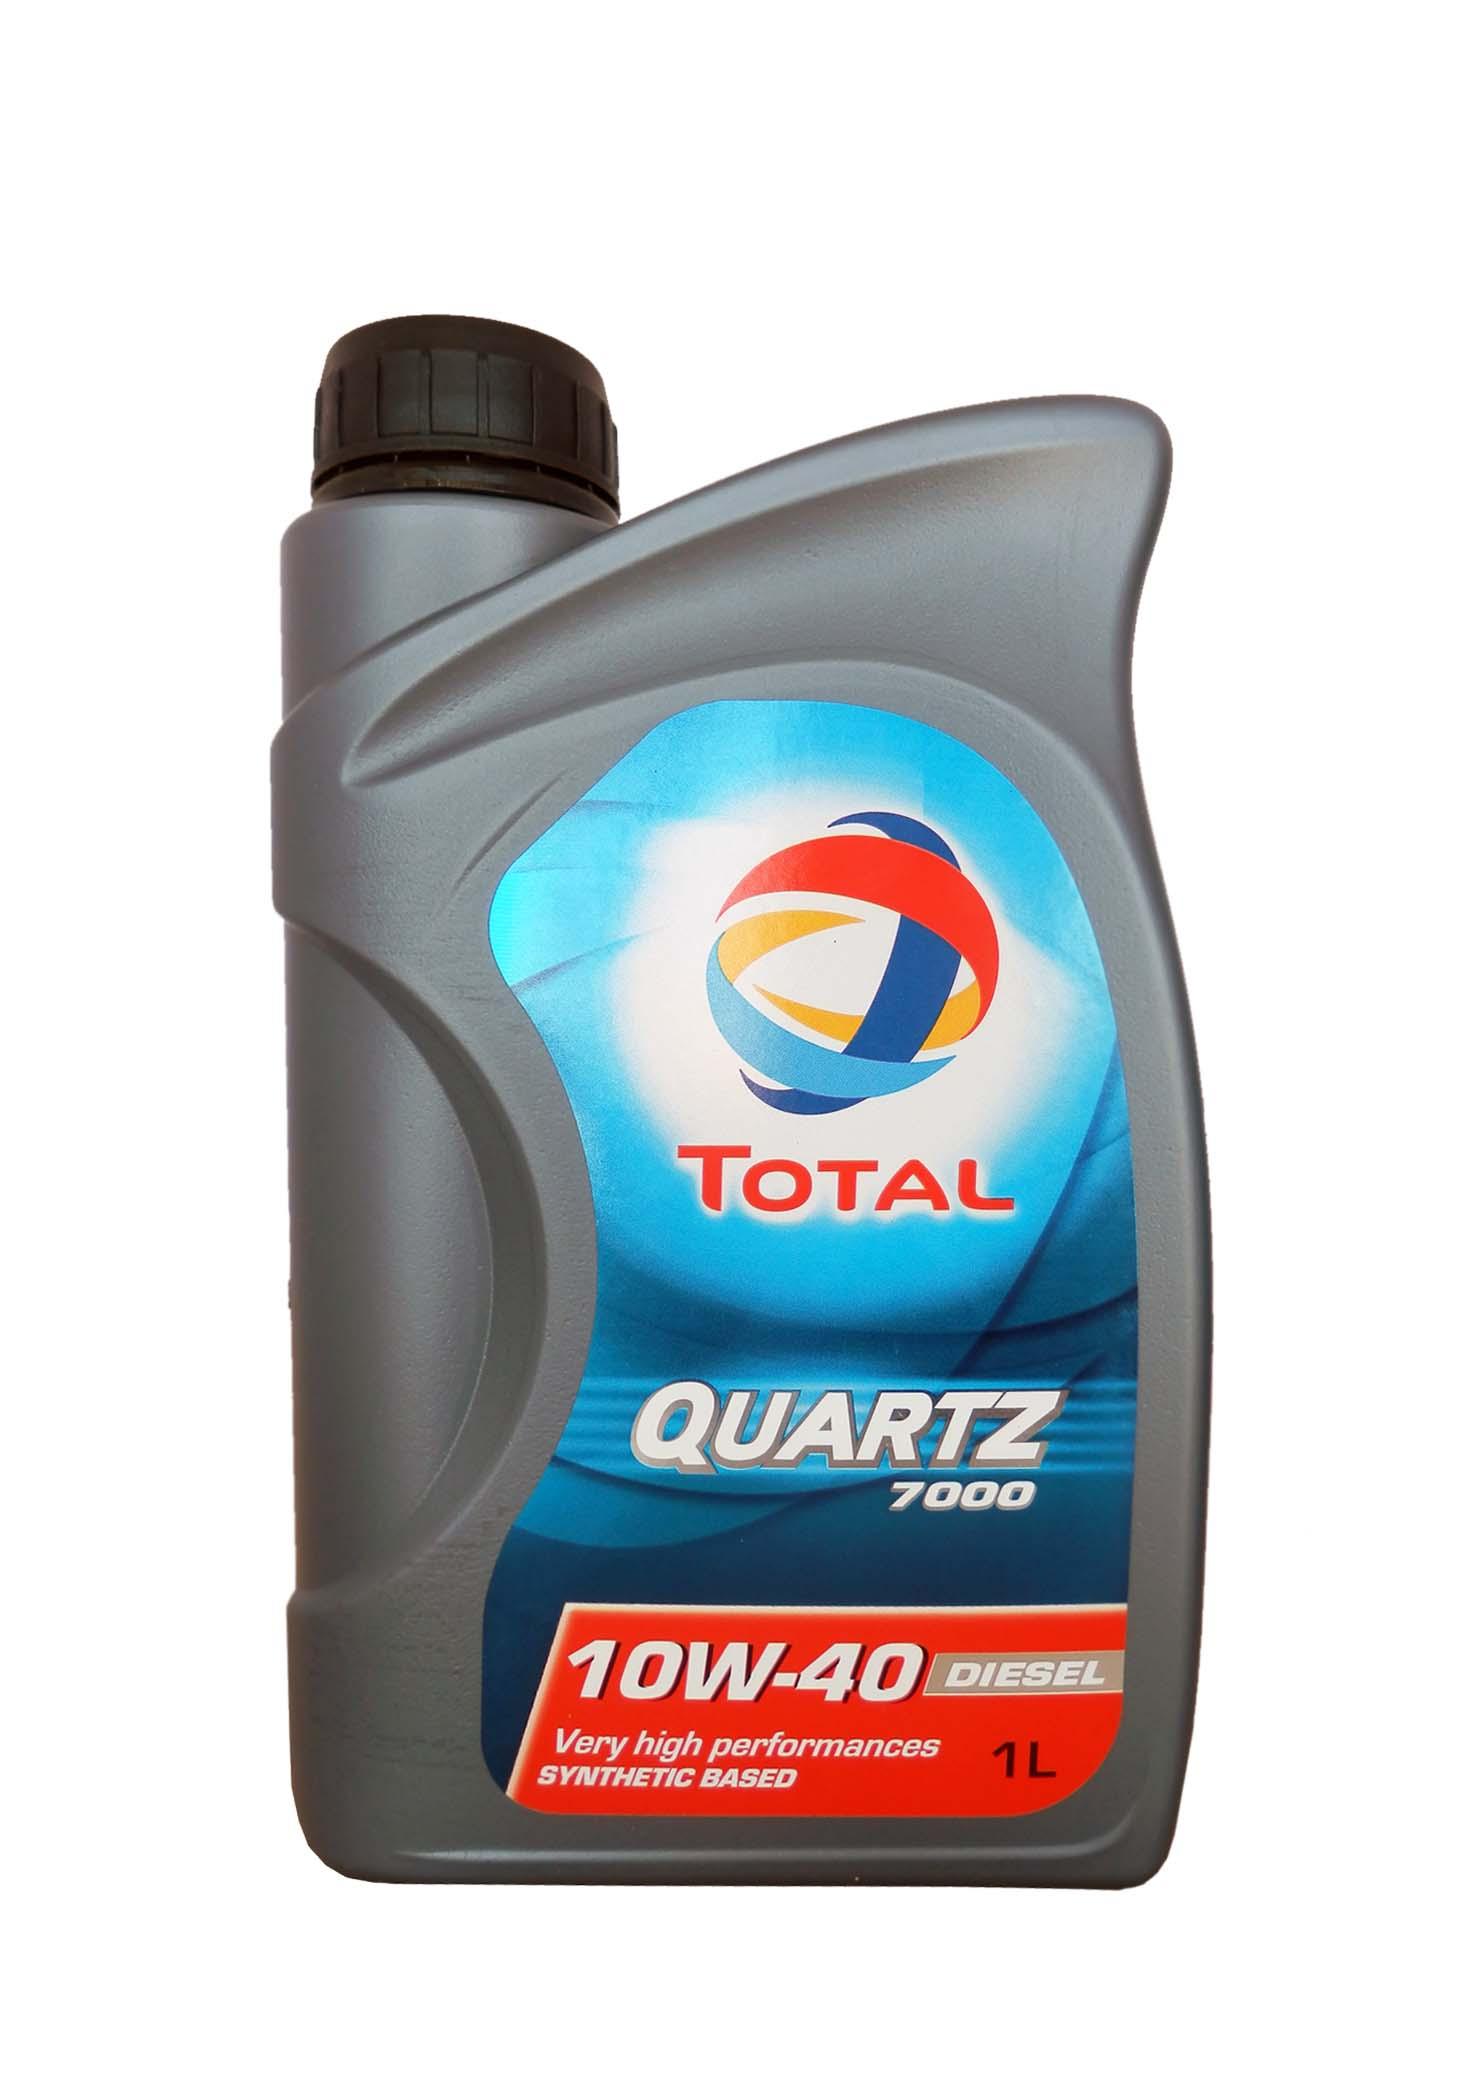 TOTAL Олива мот. QUARTZ D 7000 10W40 1л API SL/CF